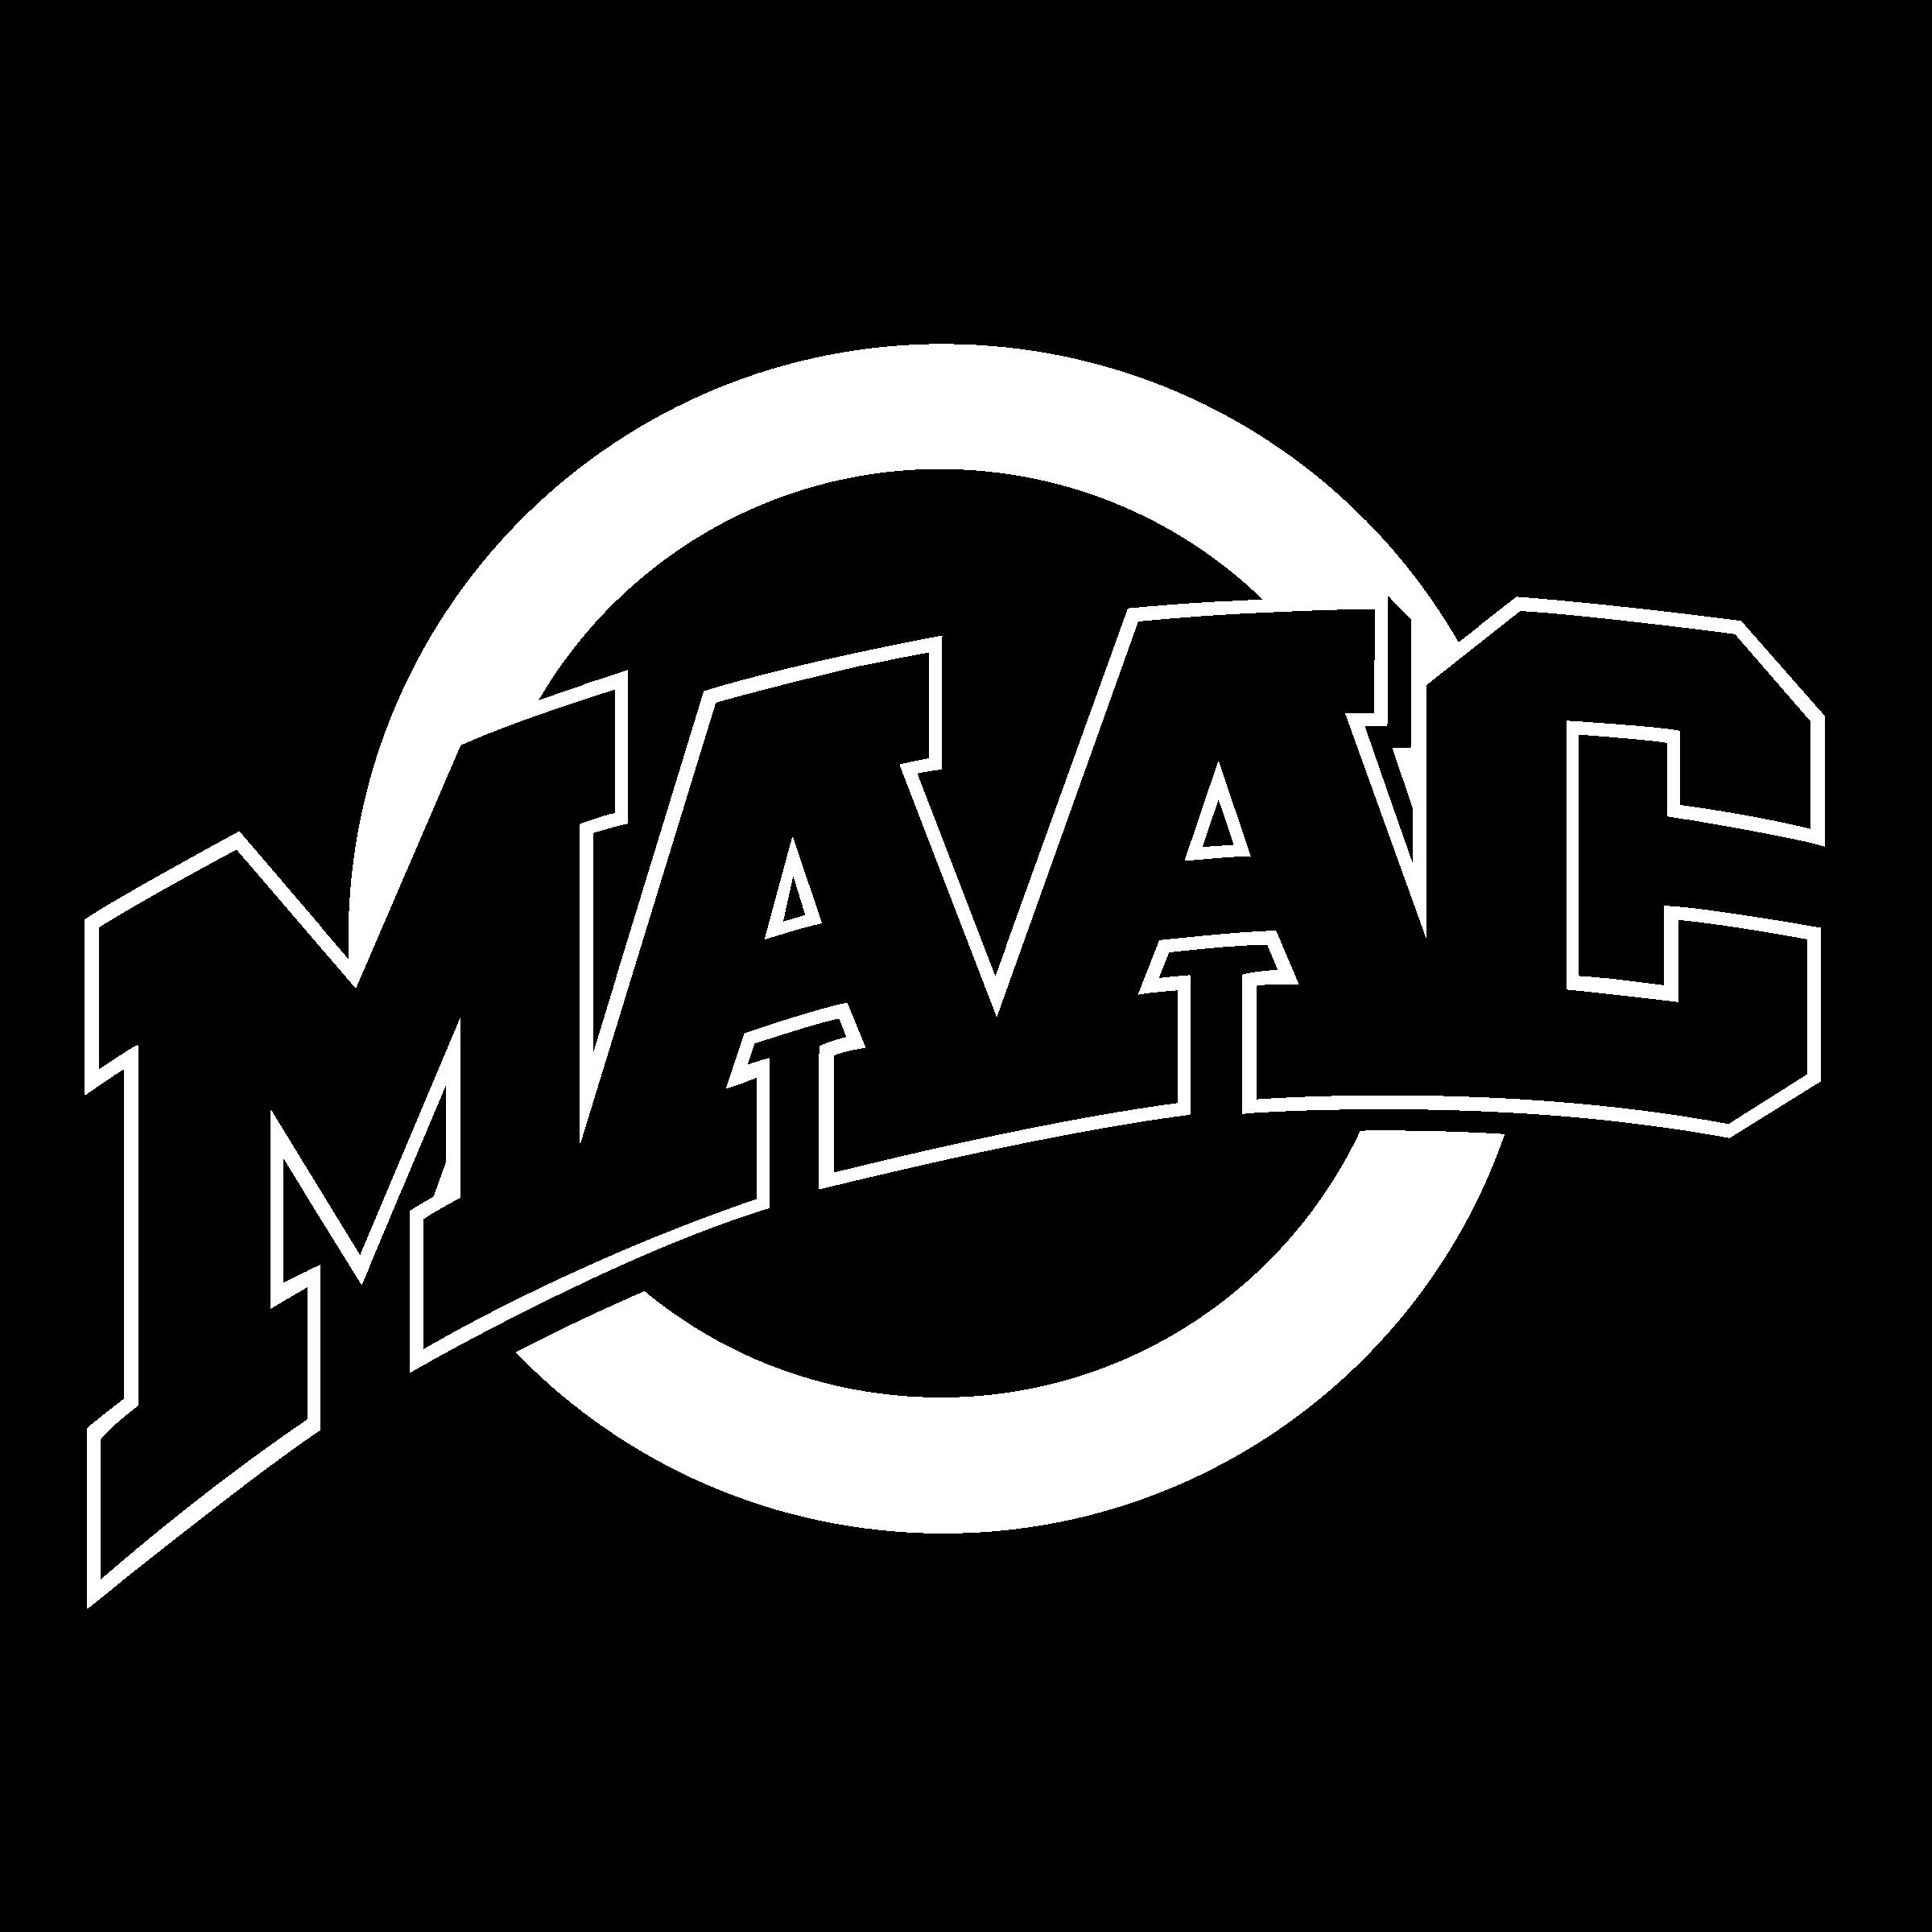 Maac logo clipart vector library library MAAC Logo PNG Transparent & SVG Vector - Freebie Supply vector library library